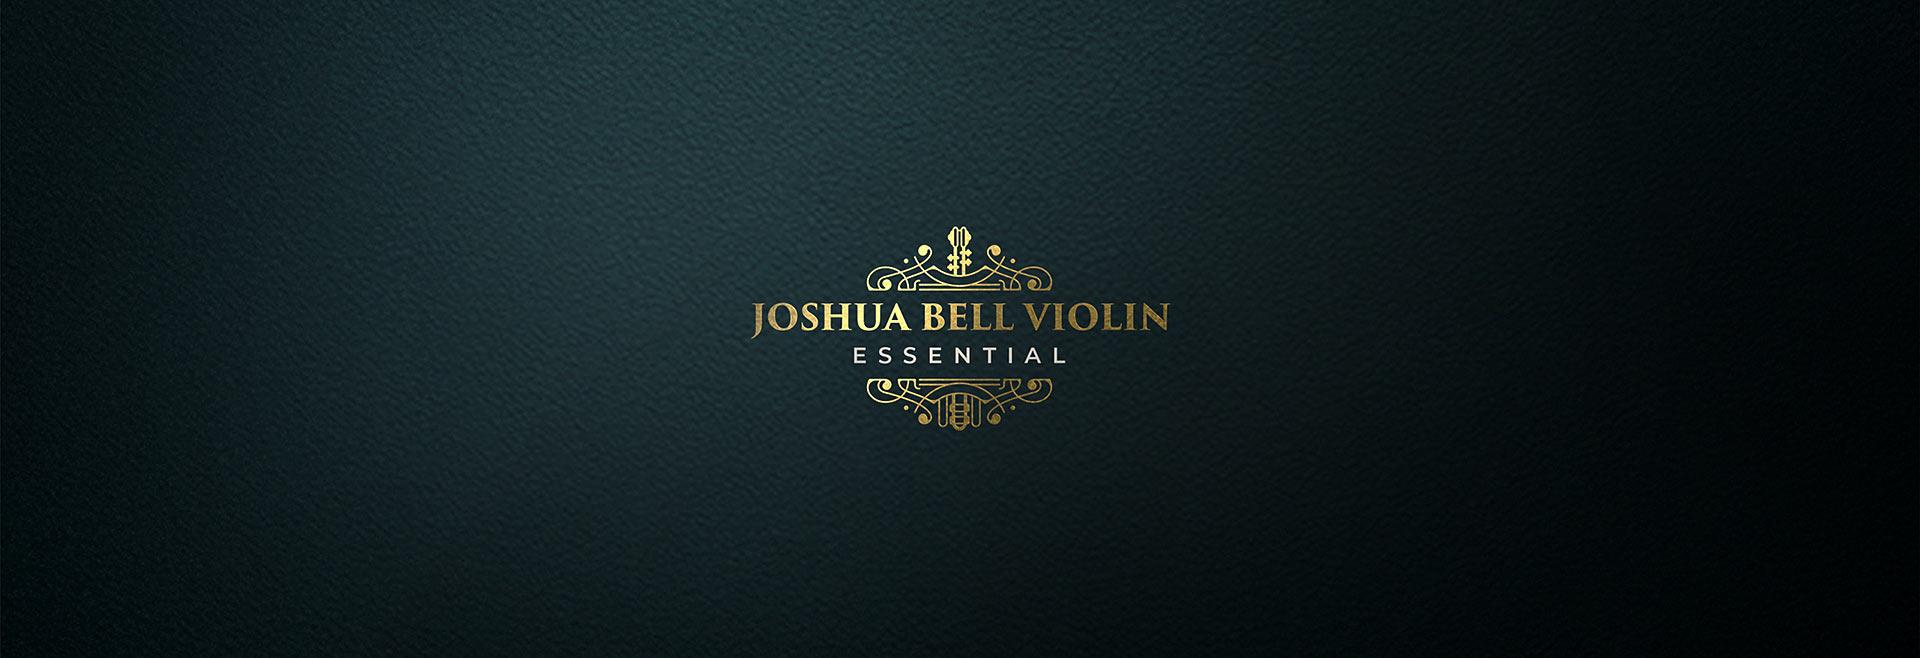 Joshua Bell Violin Essential